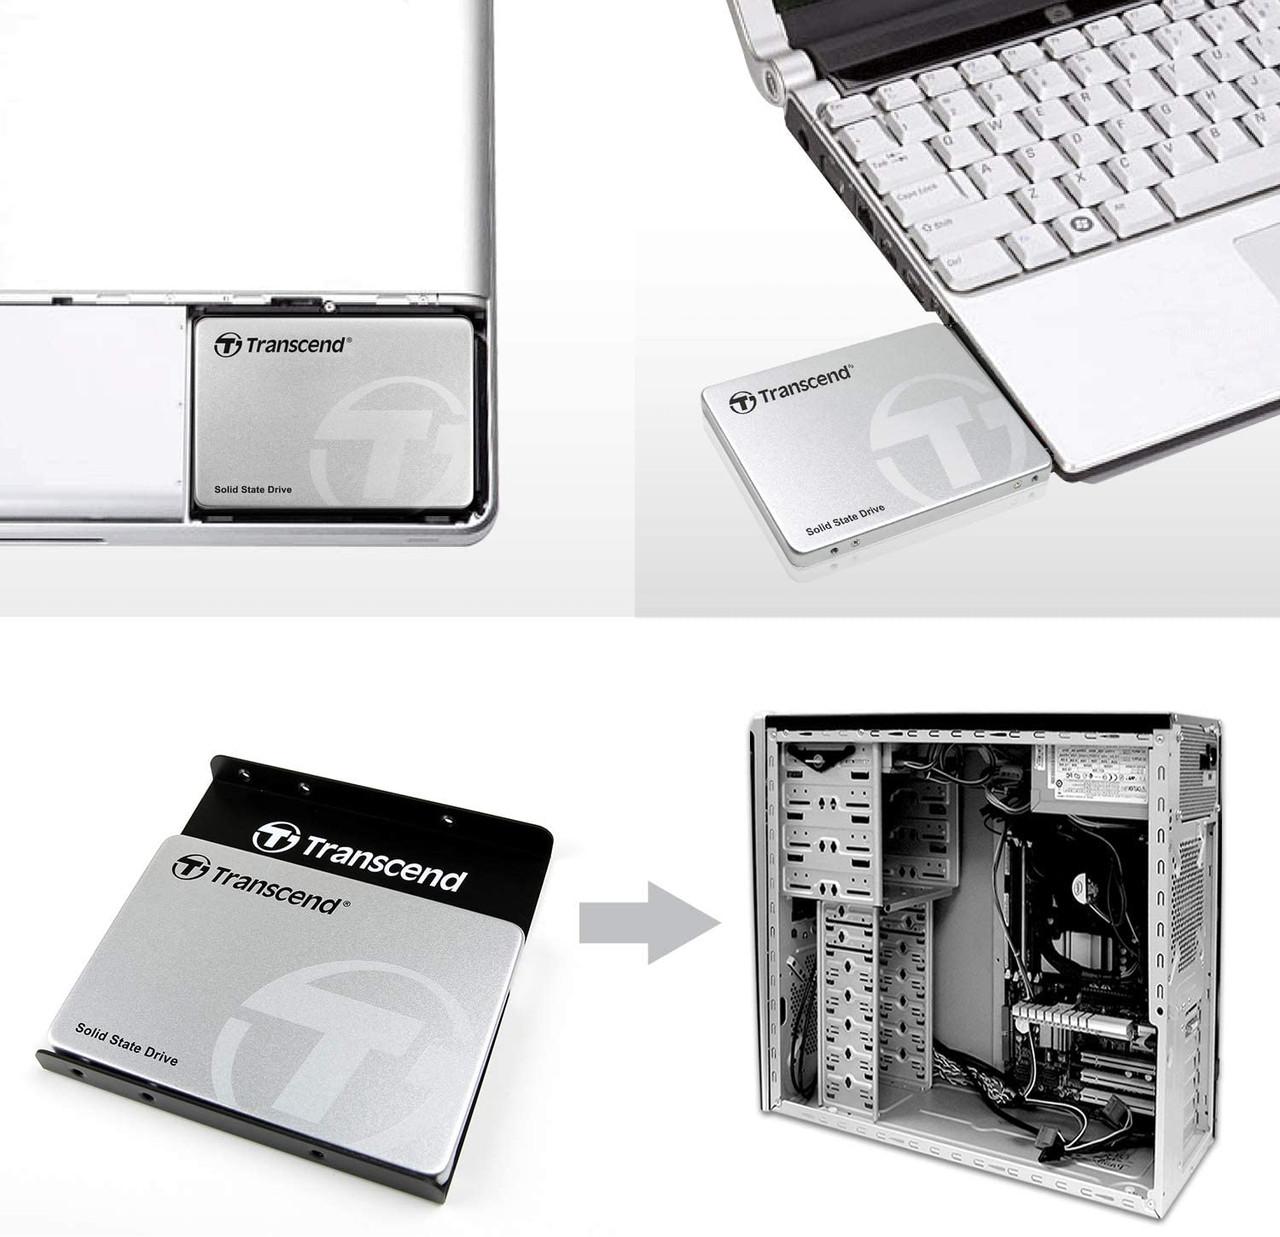 Transcend 2TB 2.5-inch SATA III 6G 3D NAND 230S series SSD